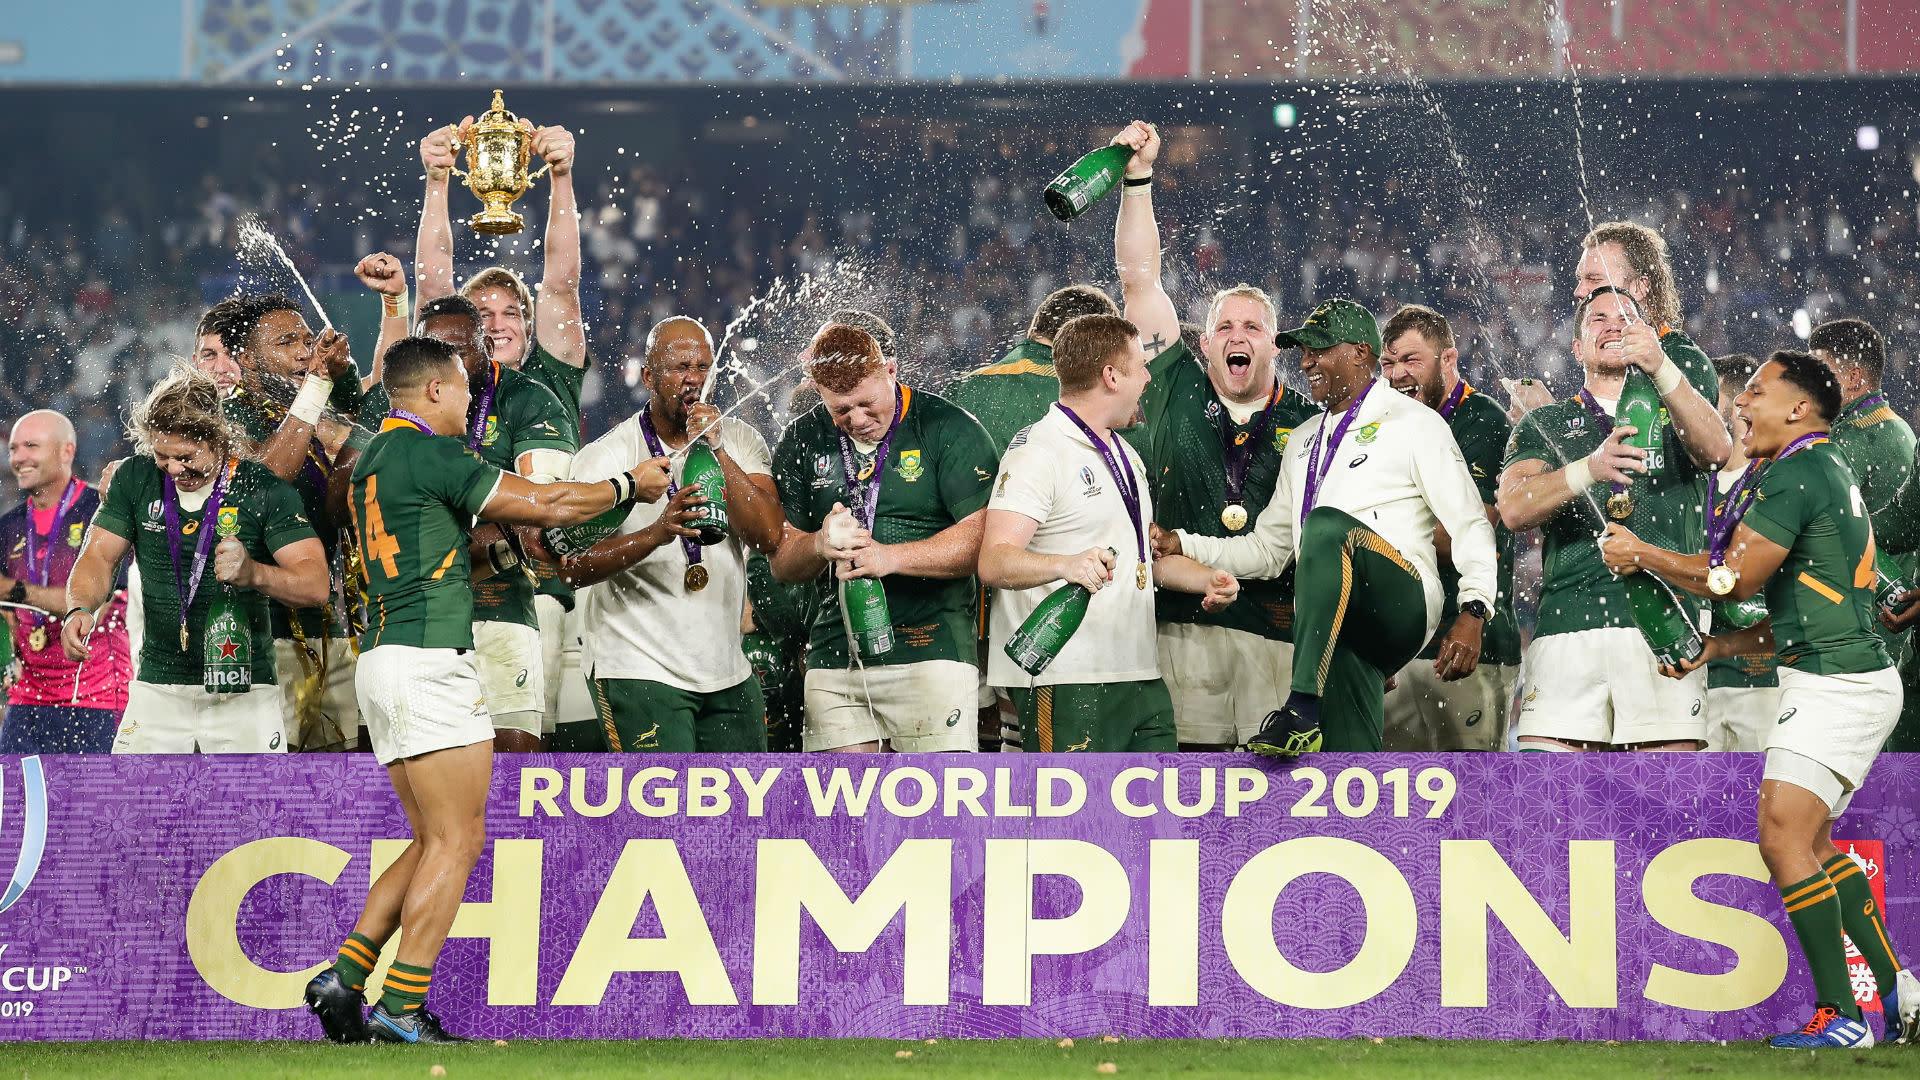 Rugby World Cup 2019 Clinical Springboks Happy Hosts Irish De Ja Vu The Top Opta Facts